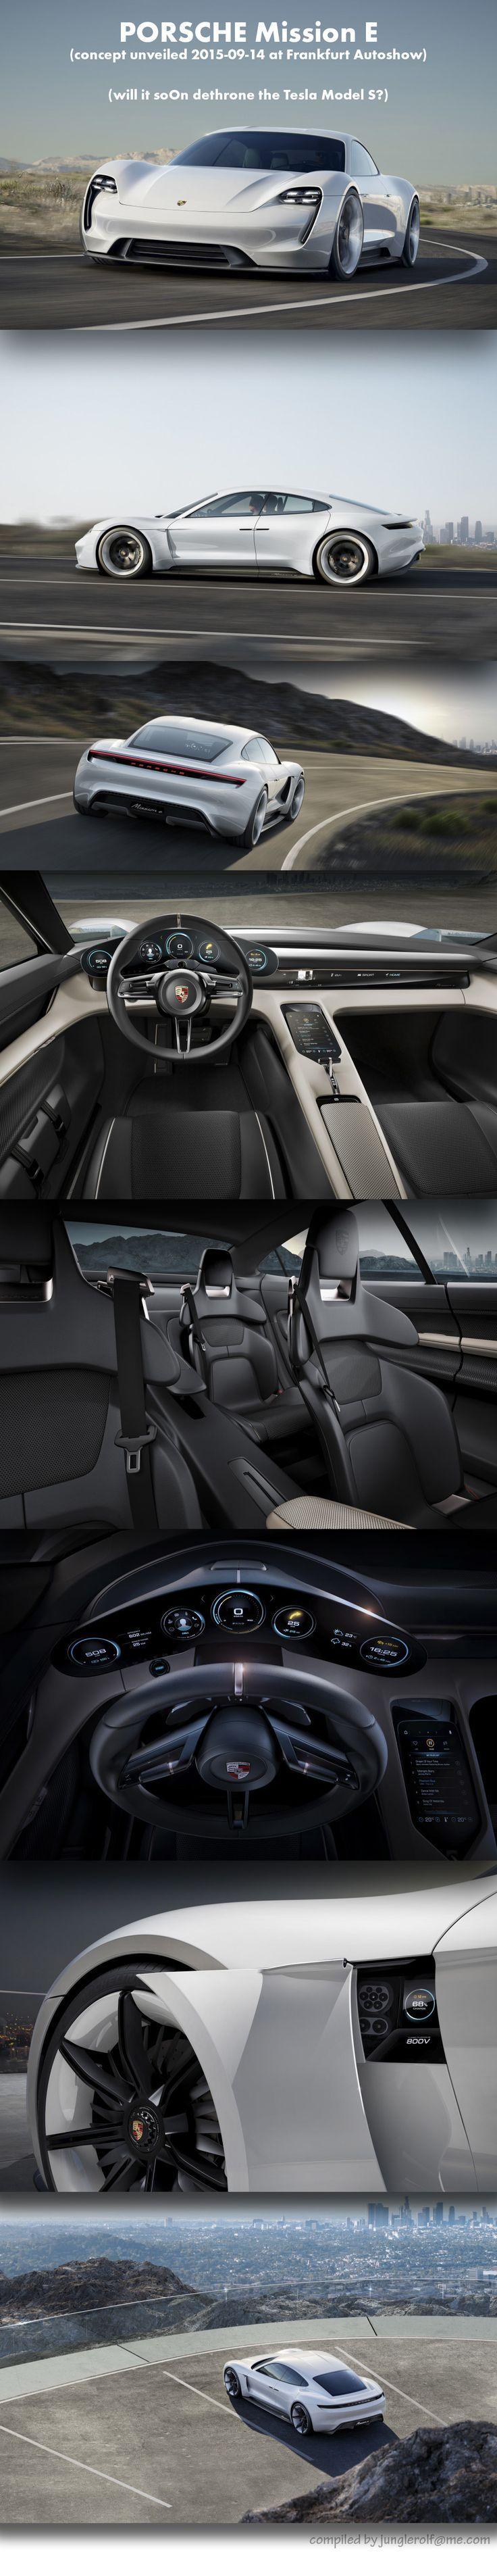 "••#PORSCHE Mission E•• will it soOn dethrone the #Tesla Model S? •concept unveiled #2015-09-14 at Frankfurt Autoshow • 310mpg vs 300 Telsa S / 0-62mph 3.5sec vs 2.8sec TS / 80% battery charge in 15min supersedes TS • 2 motors 600hp • 4-wheel drive • 4' 3"" ta"